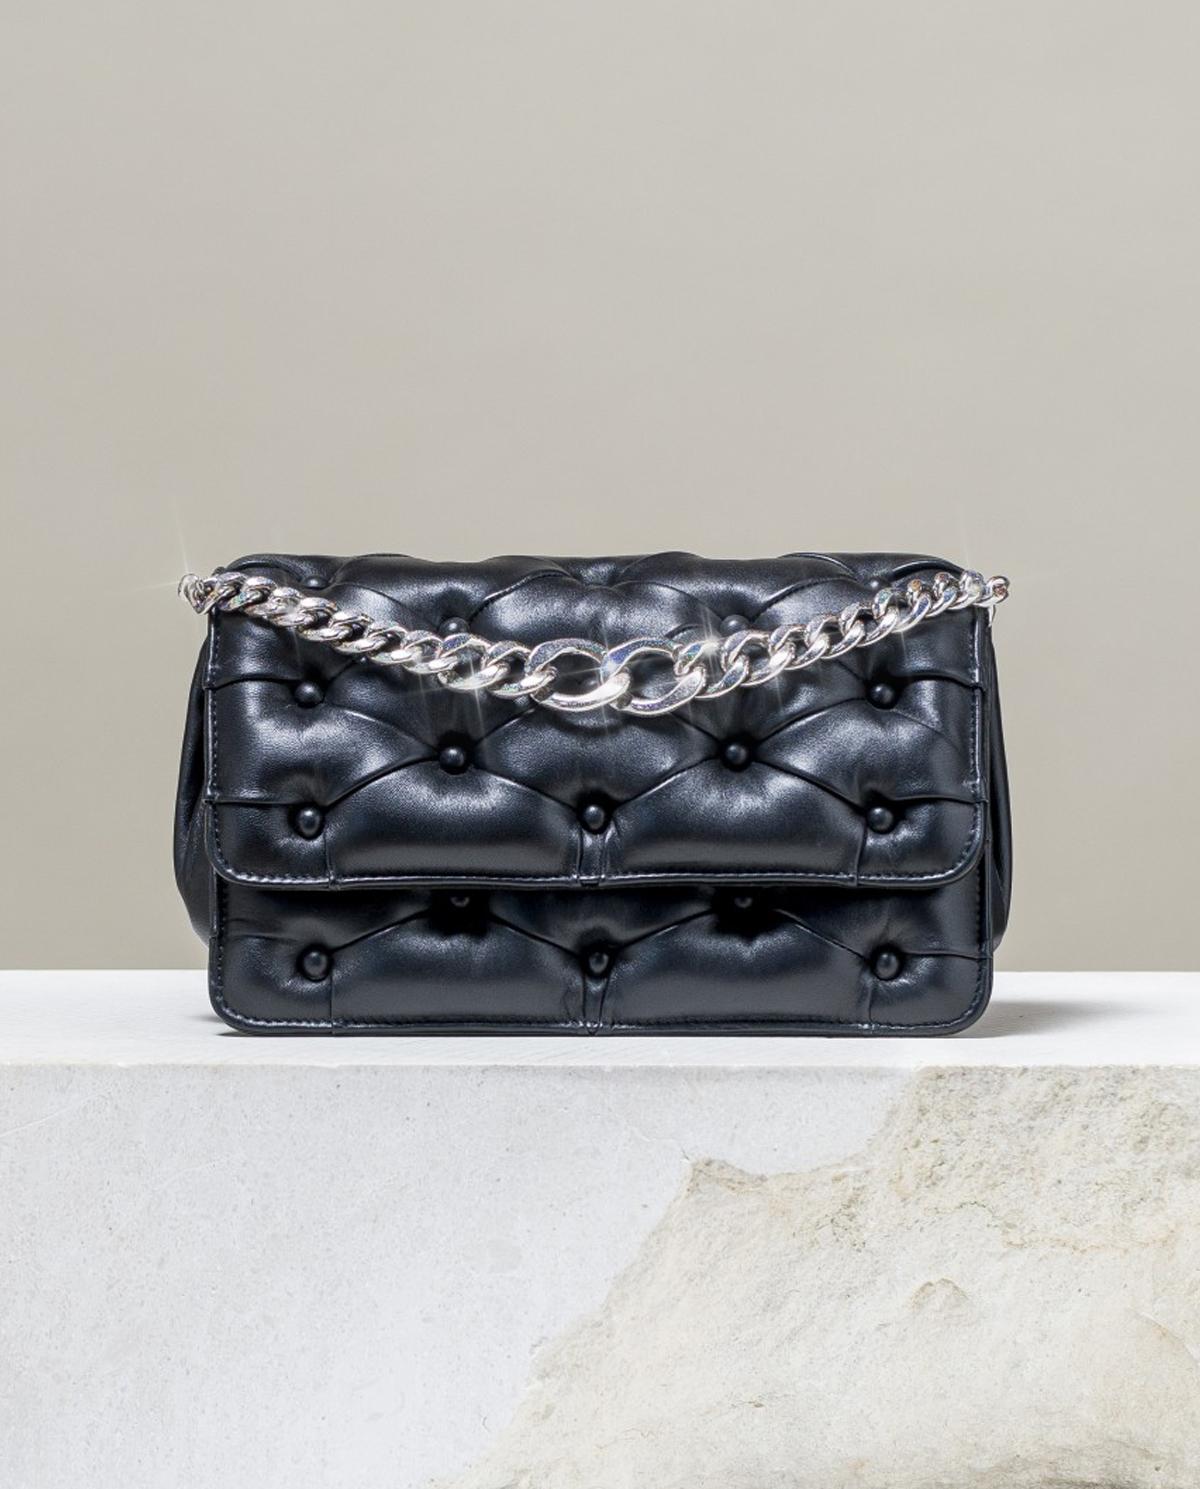 Pikowana torebka Carmen Benedetta Bruzziches 4517 BLACK